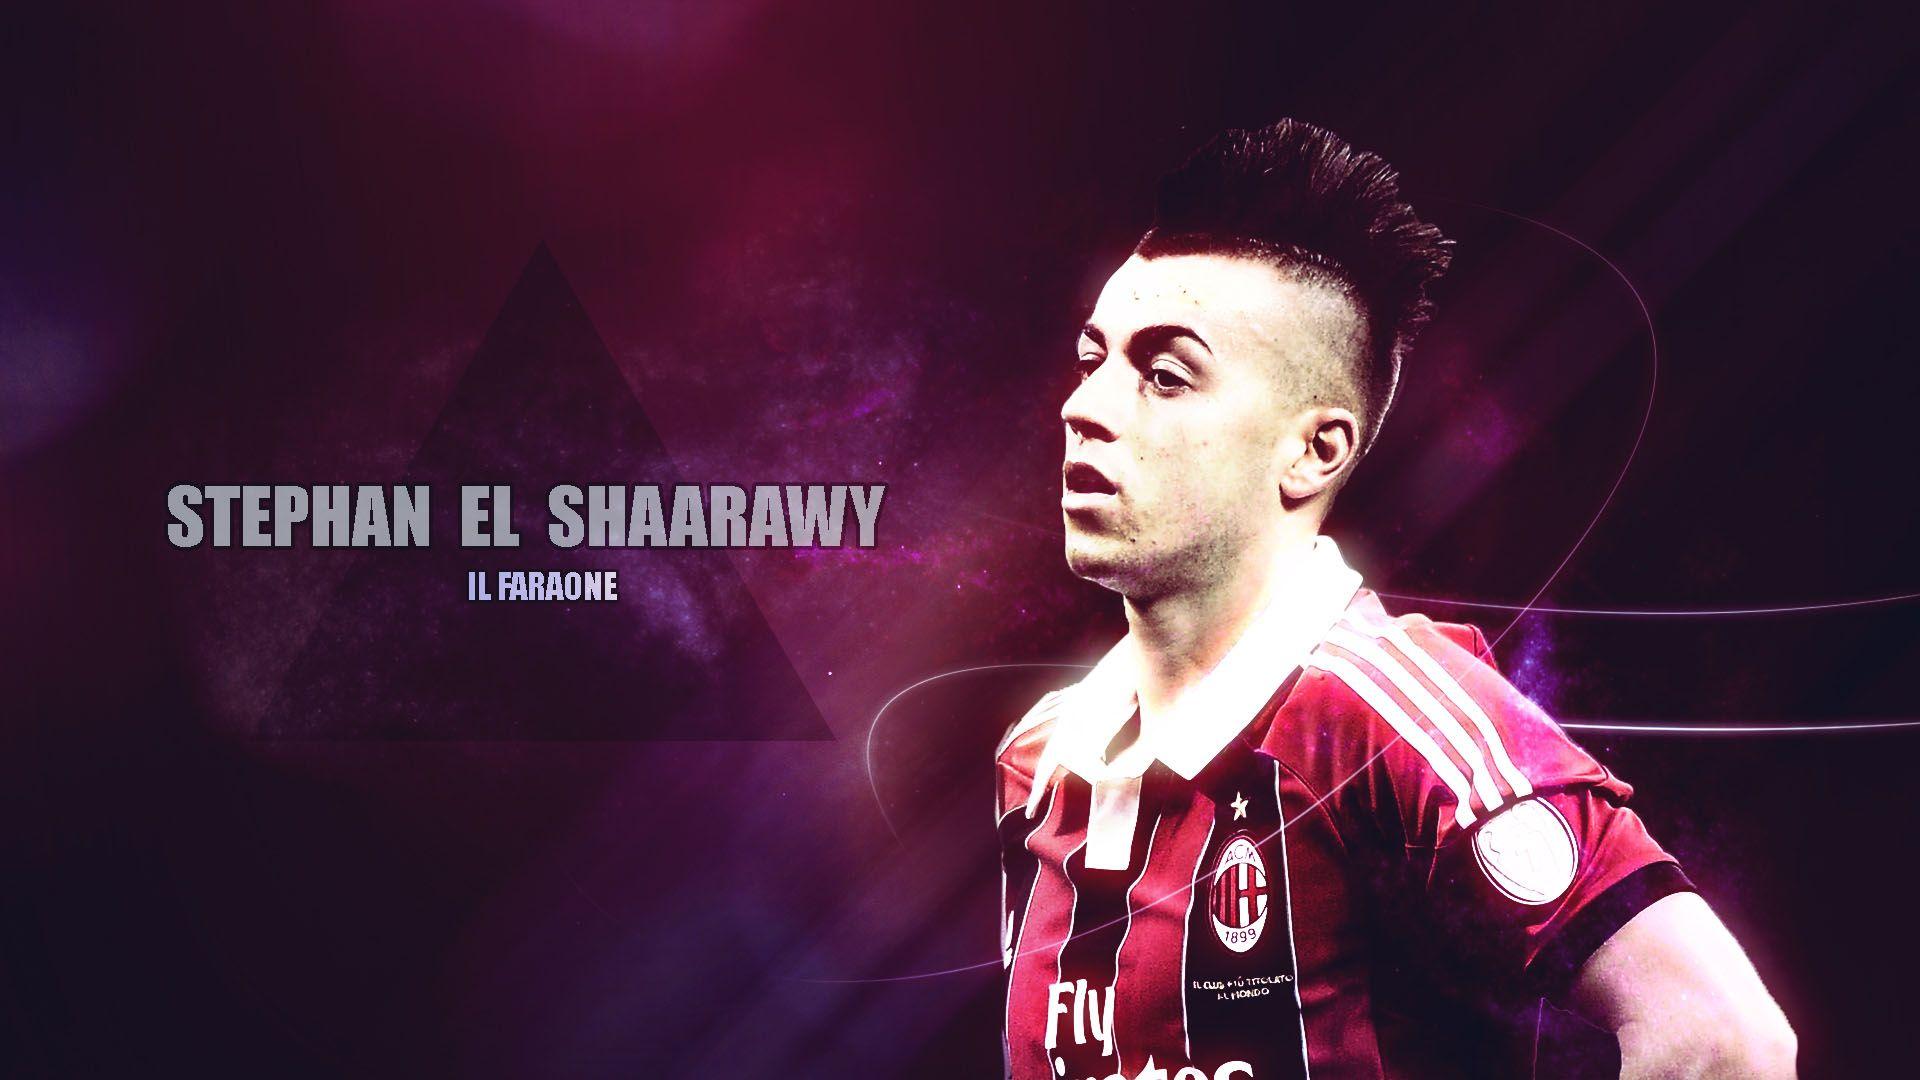 Download HQ El Shaarawy AC Milan 2015 Wallpaper HD Wallpapers 1920x1080